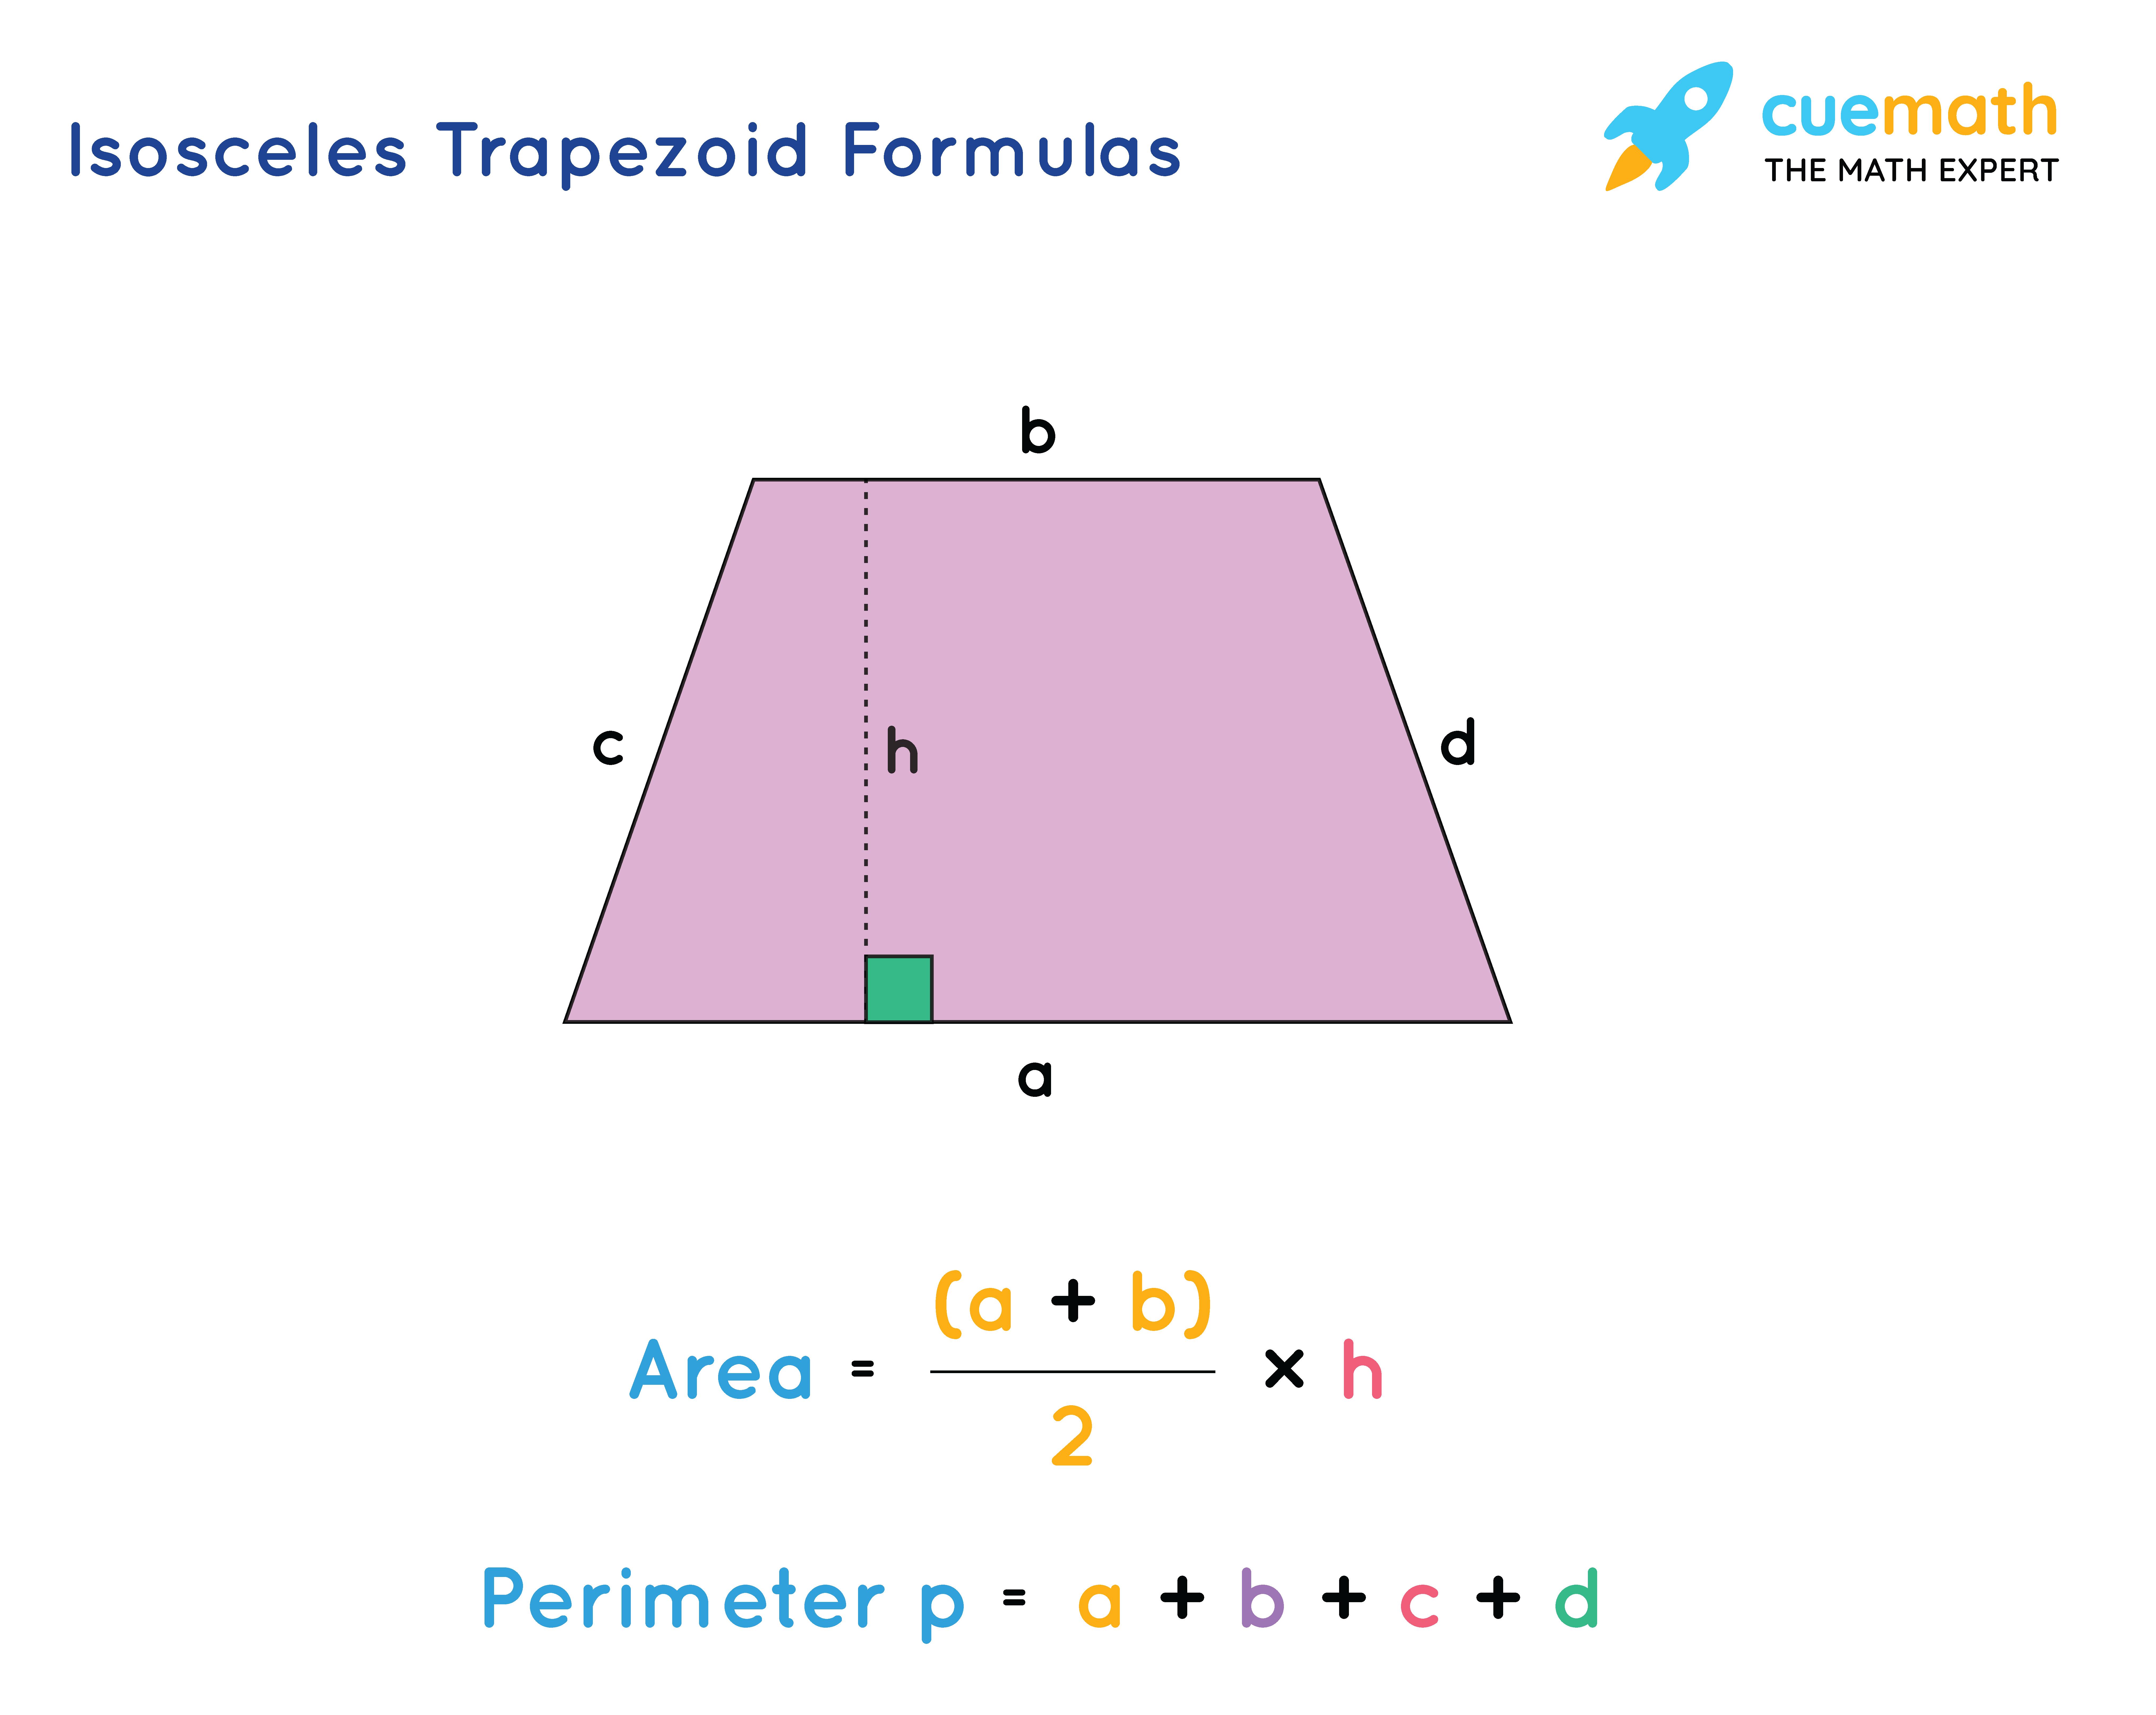 Isosceles Trapezoid Formulas